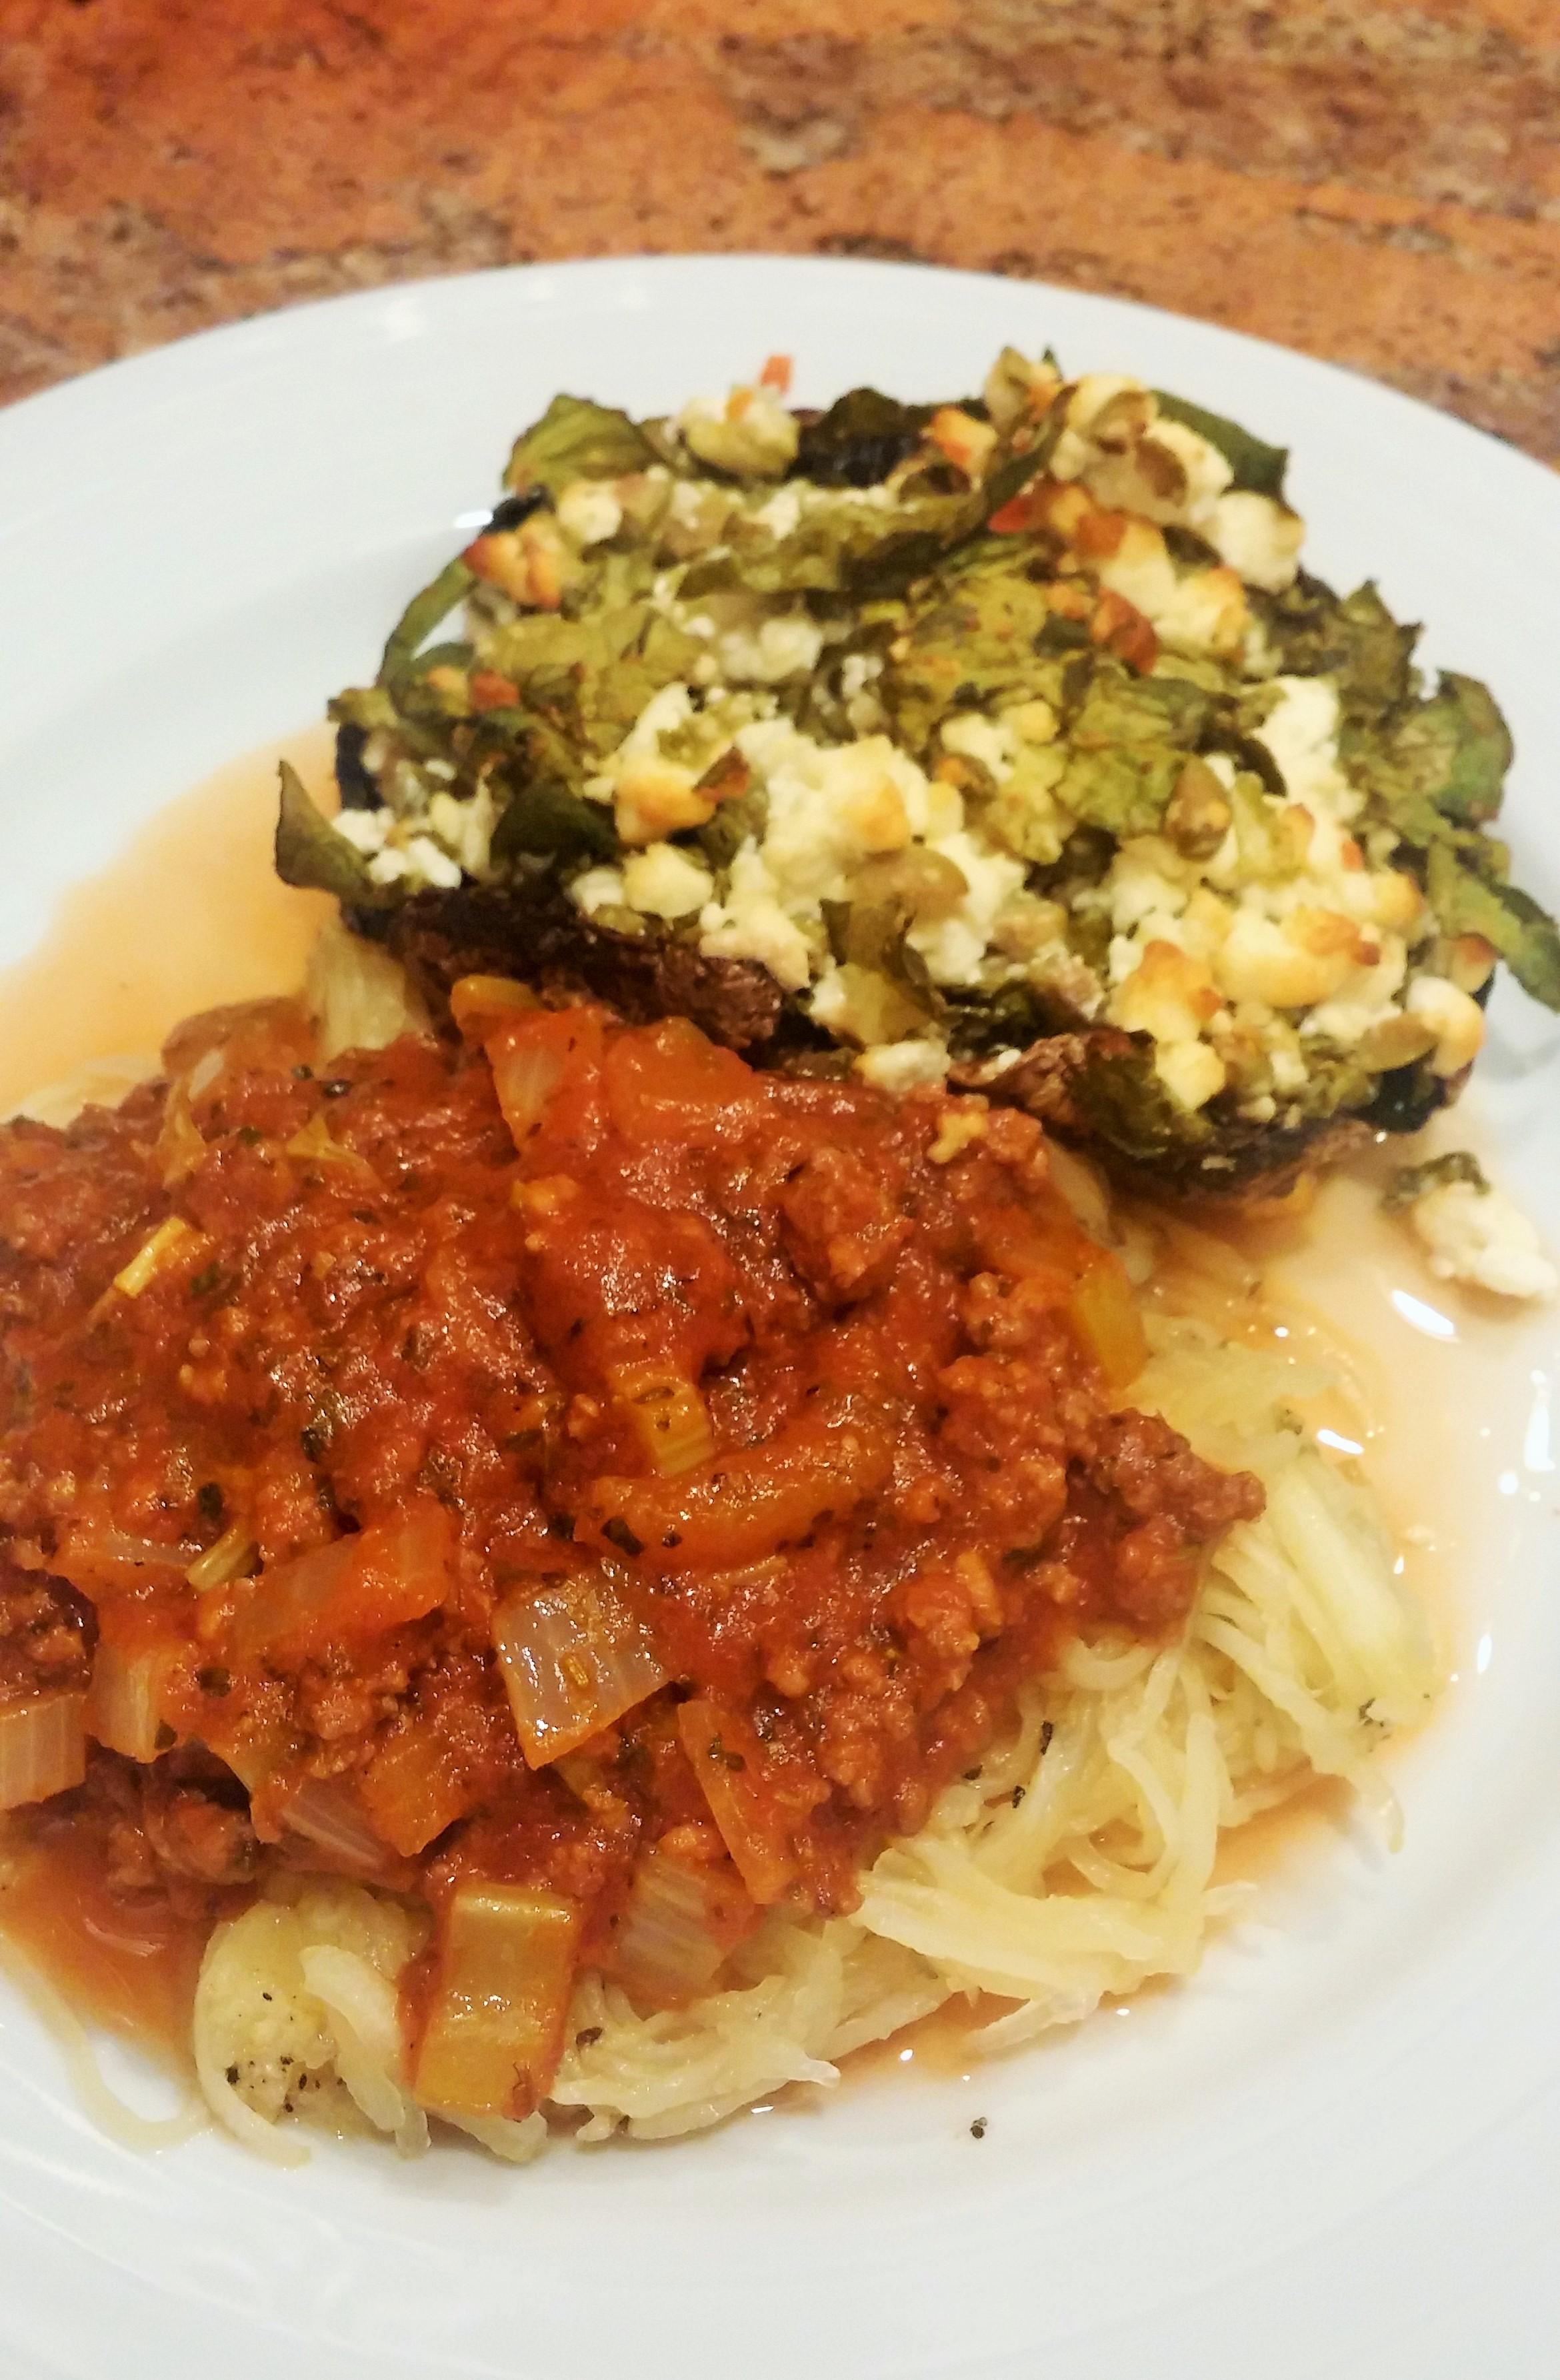 Spaghetti Squash & Hearty Buffalo Meat Sauce